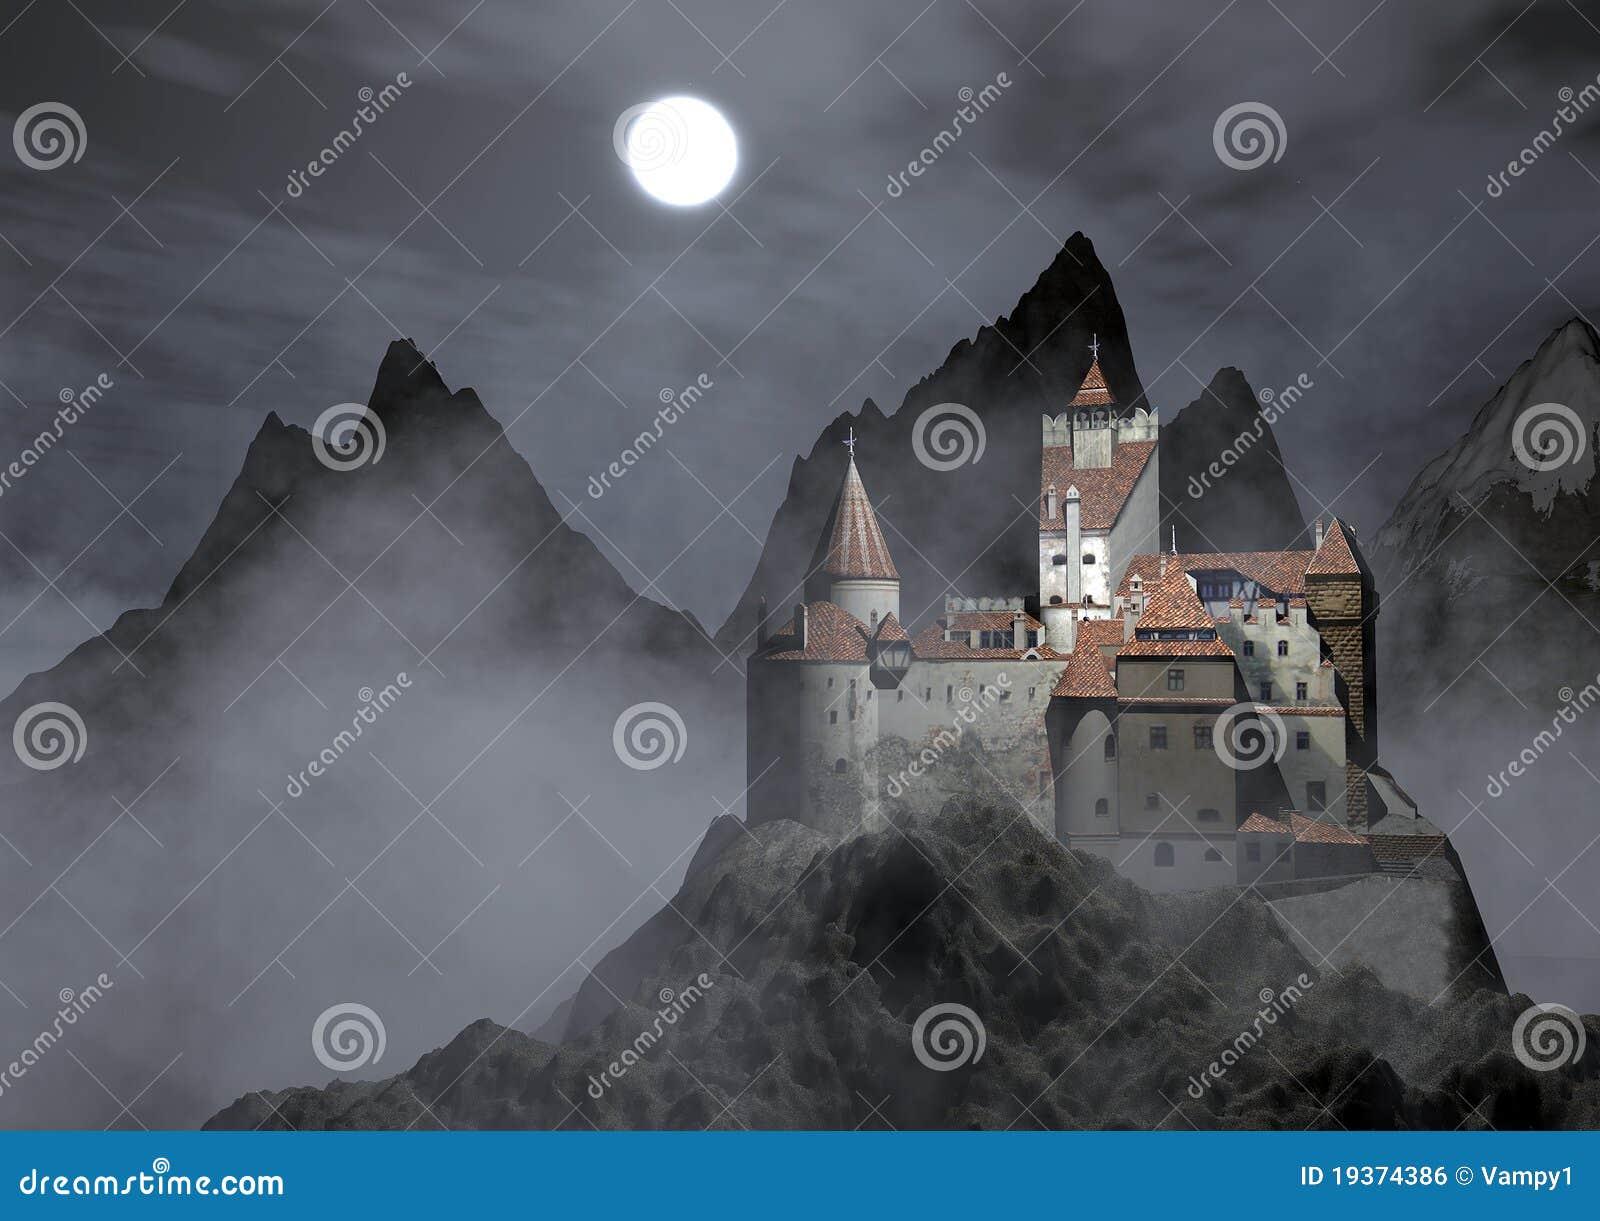 Castelo de Dracula